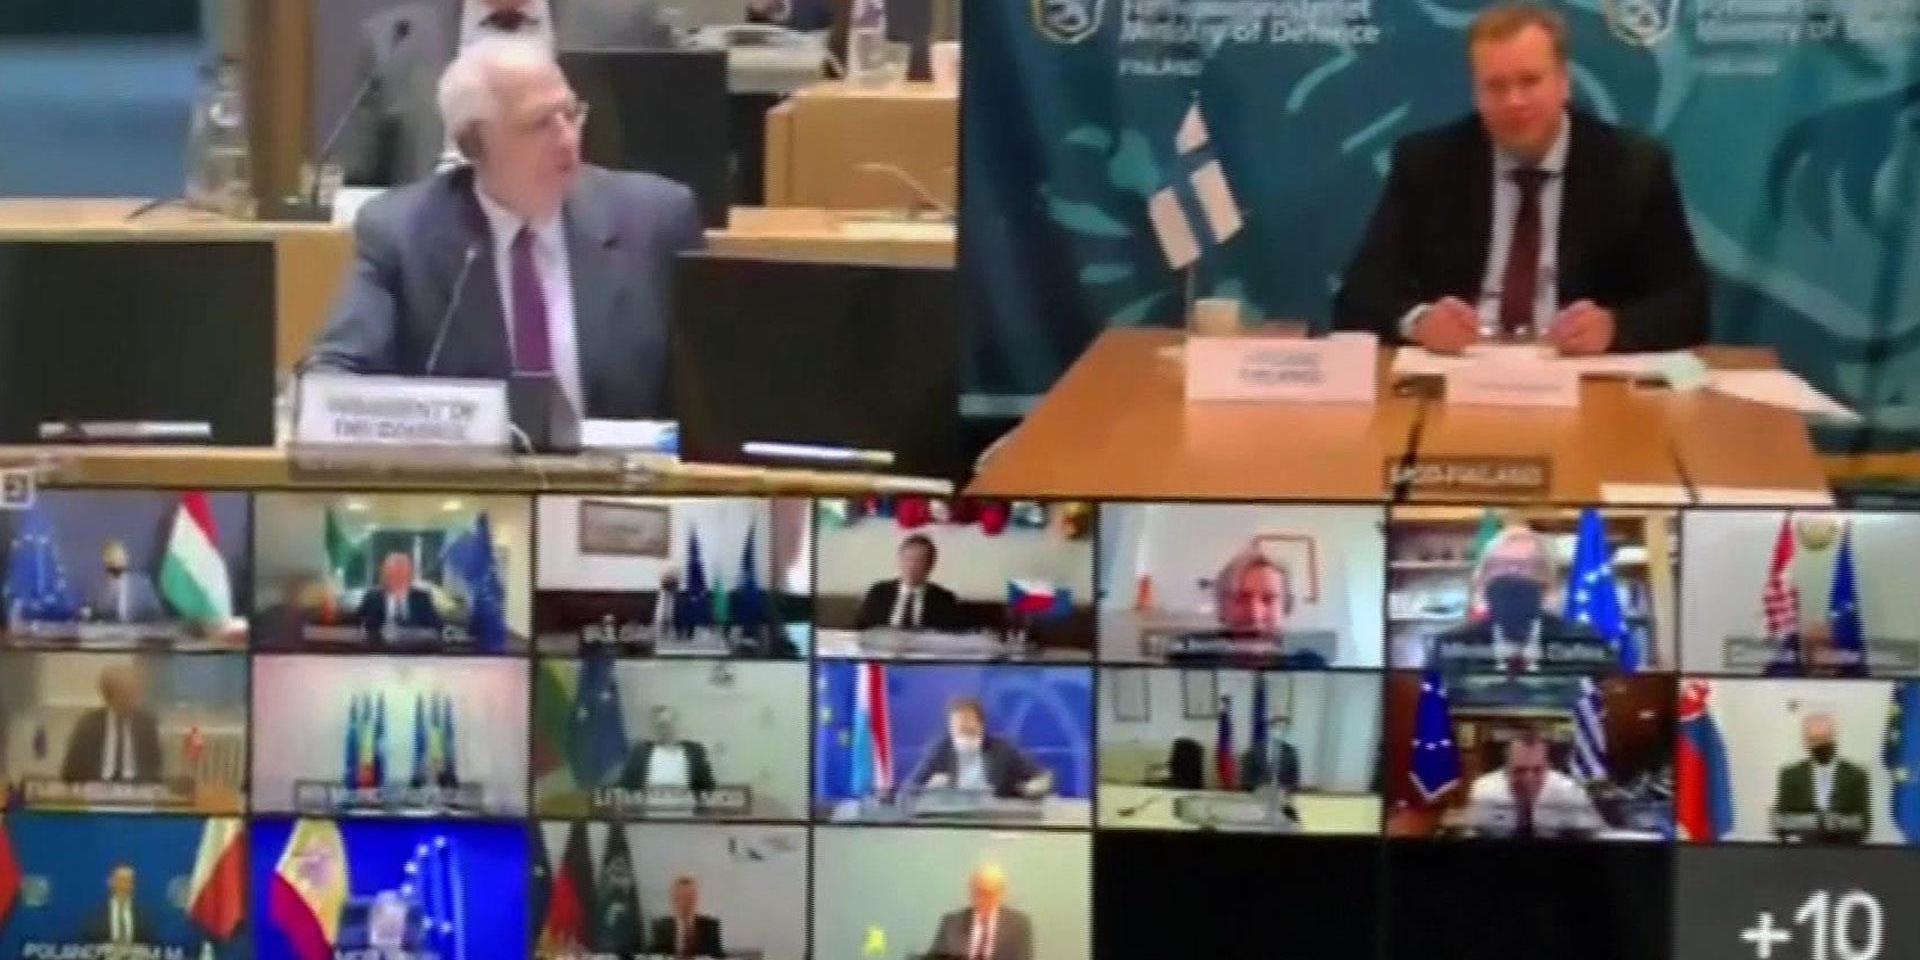 Journalist Gains Access to Confidential EU Defense Video Call | Tech.co